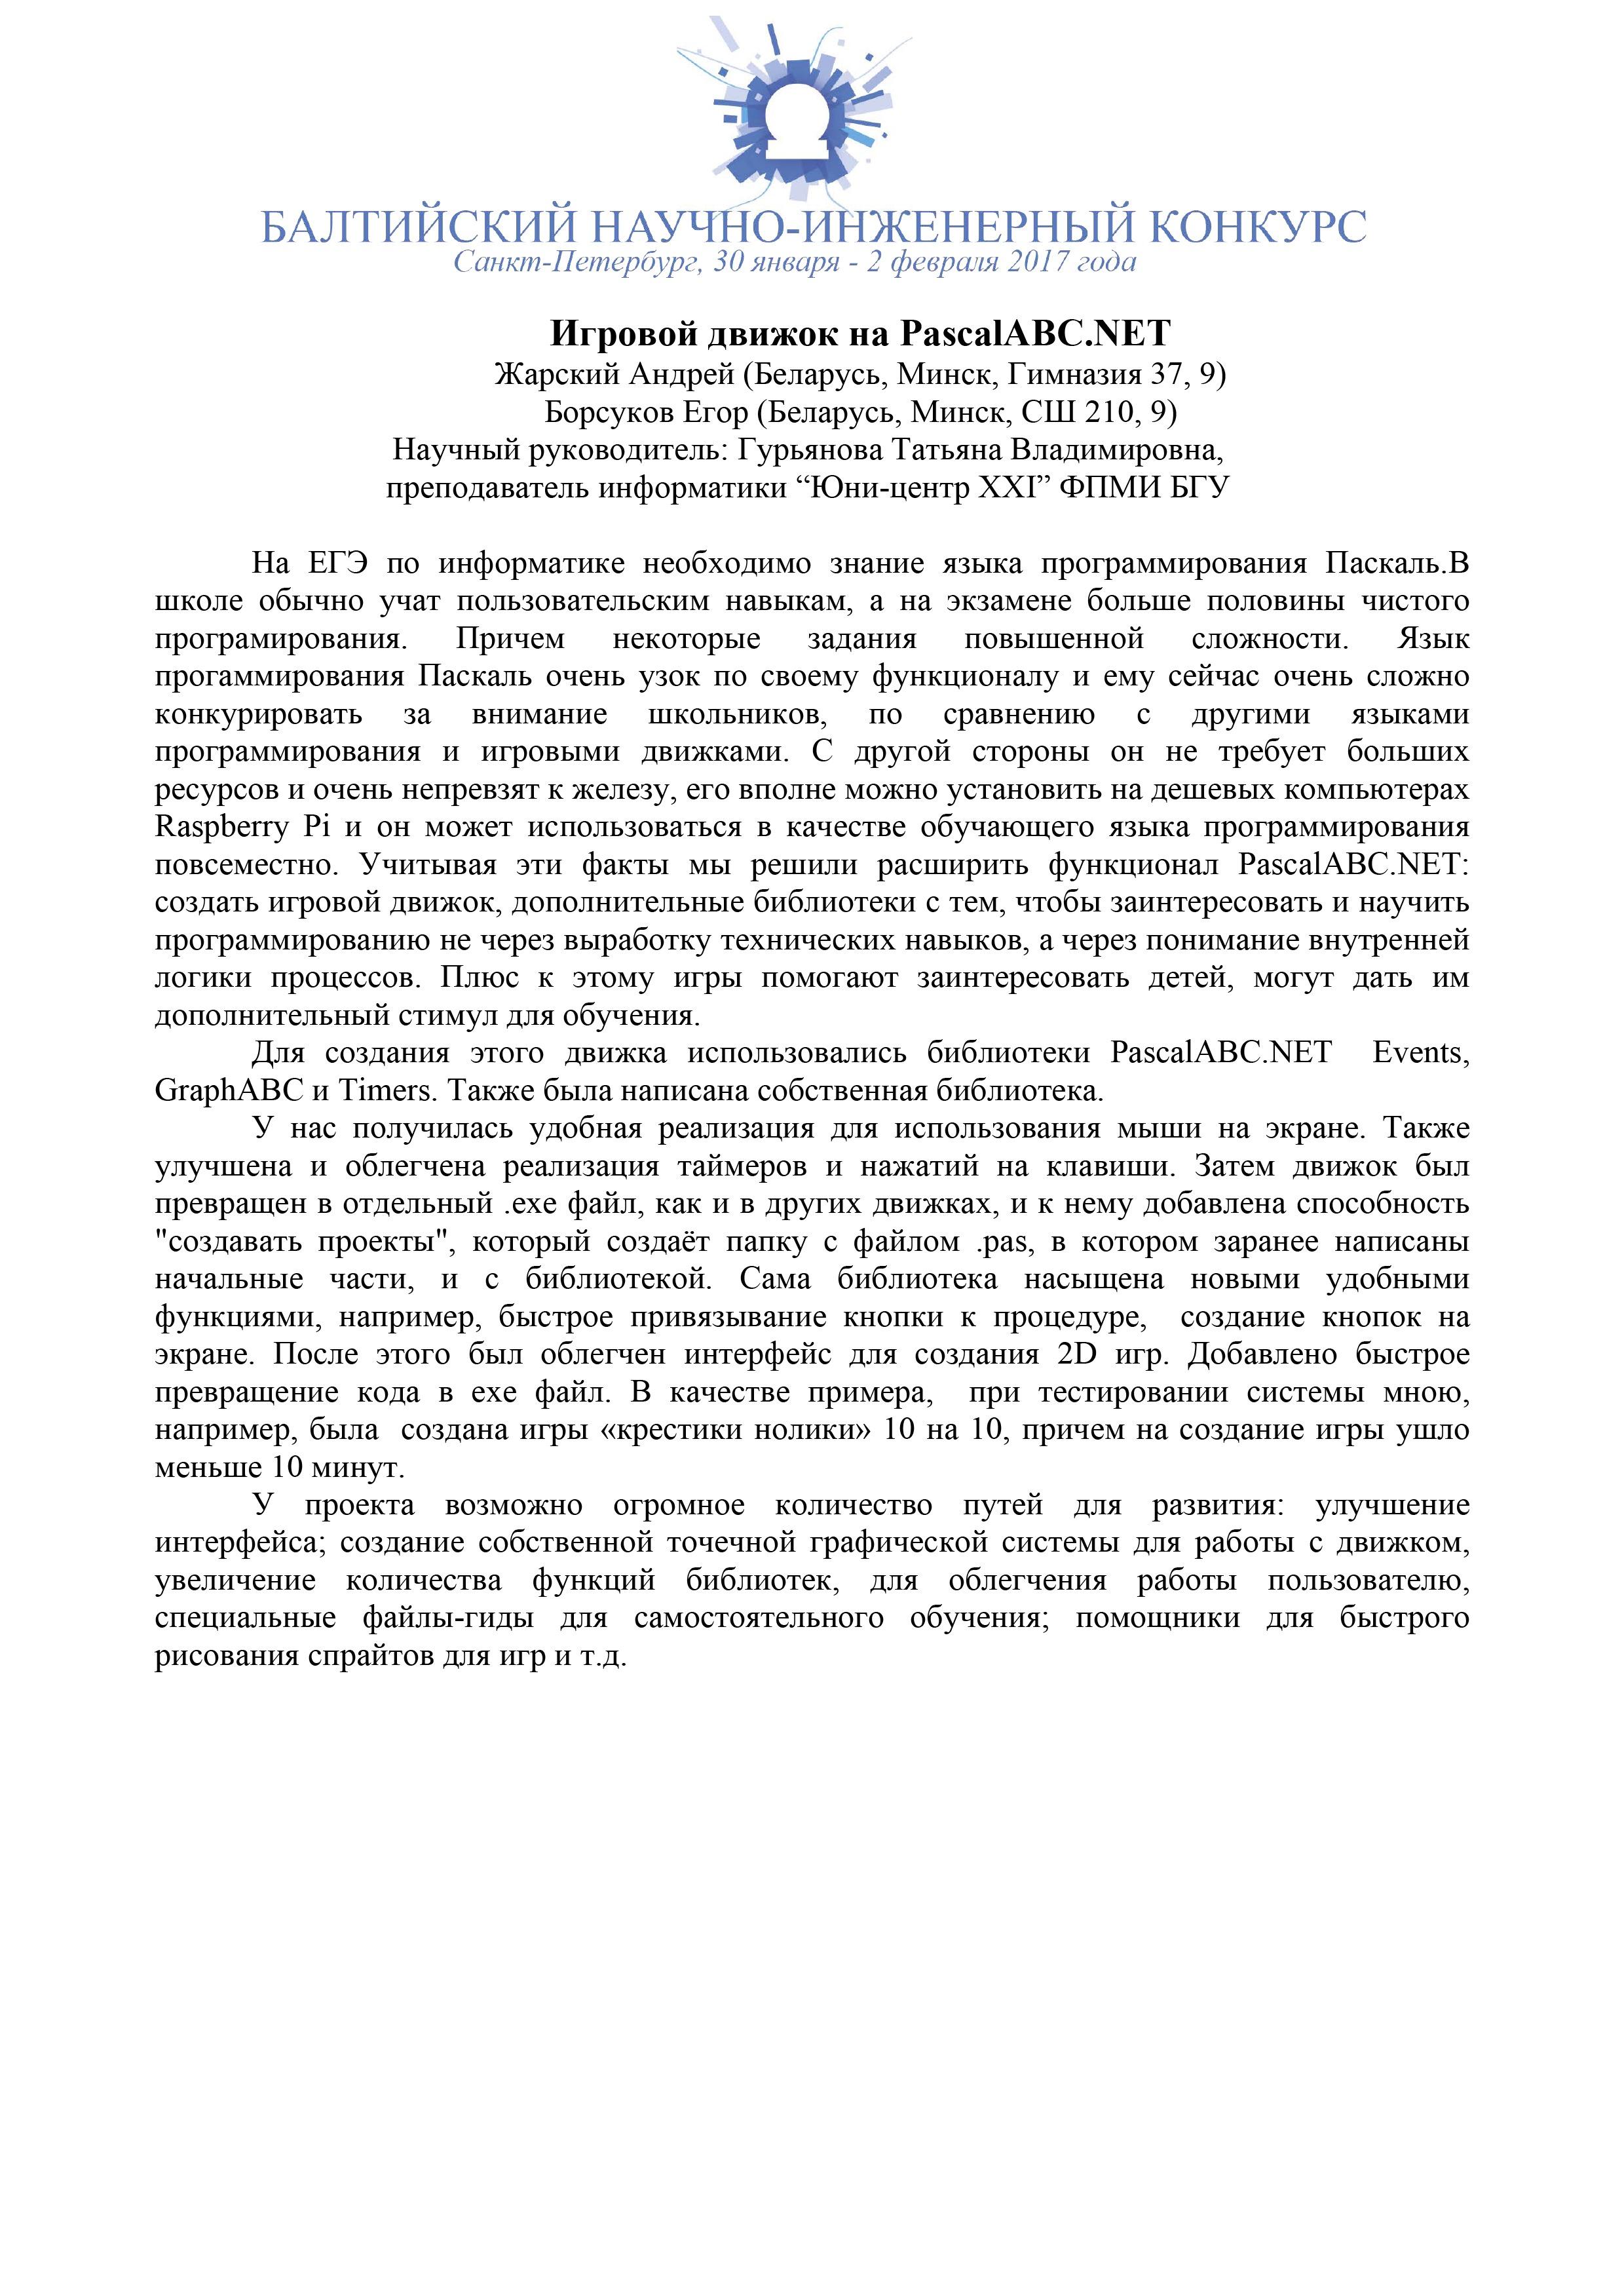 Сборник тезисов-105